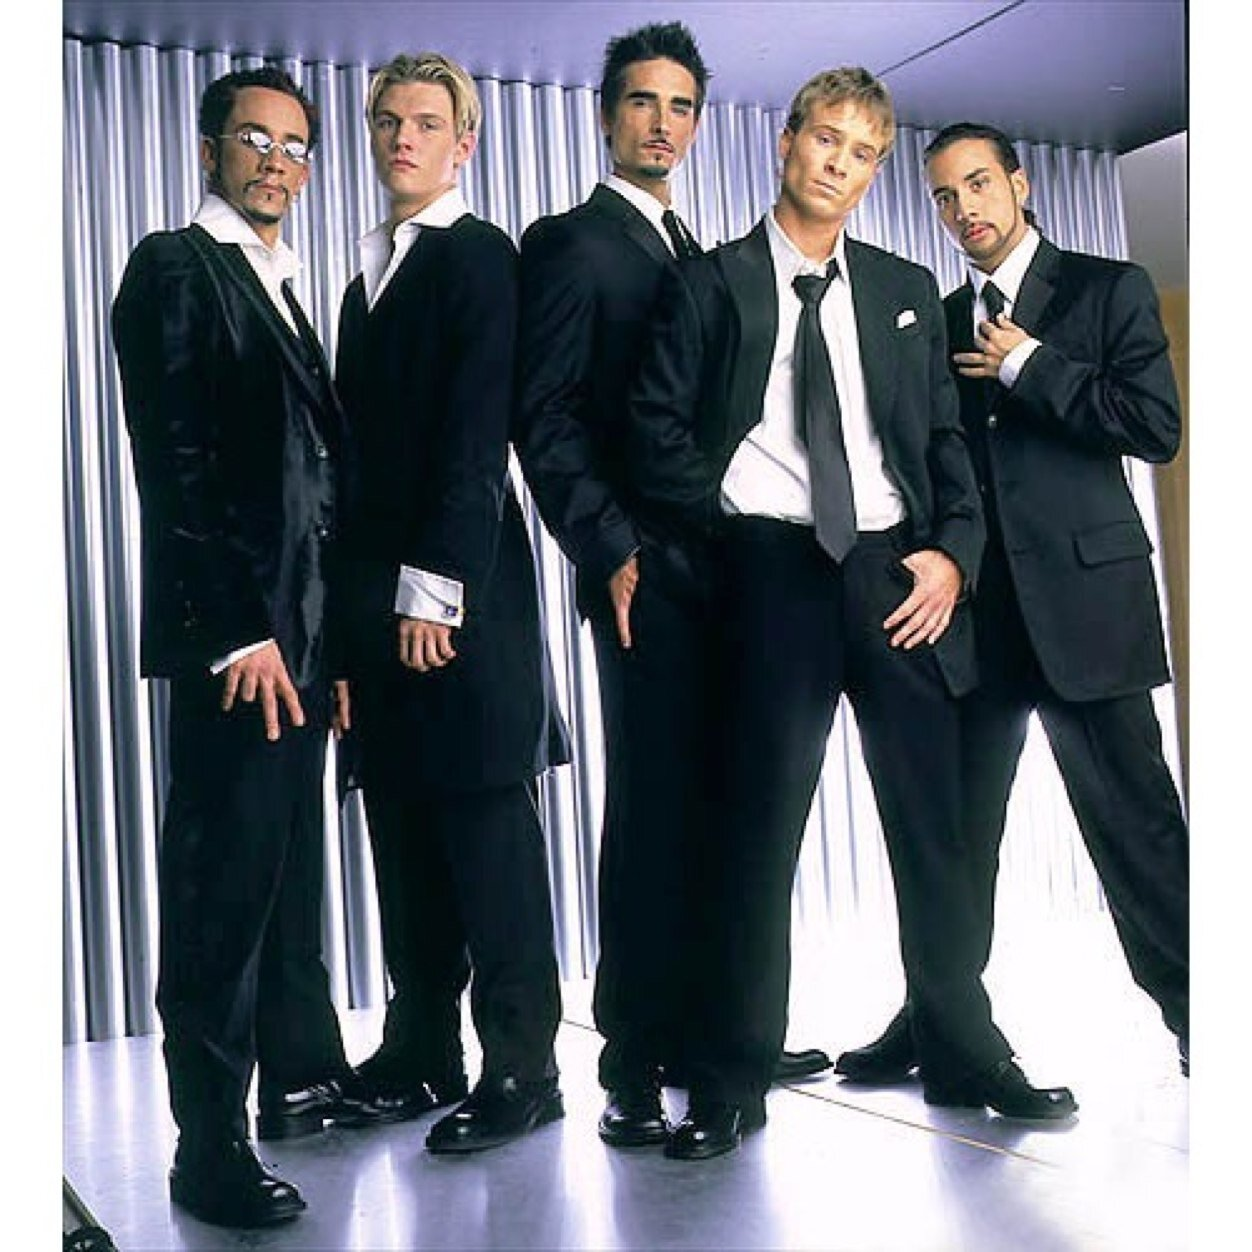 backstreet boys - photo #22